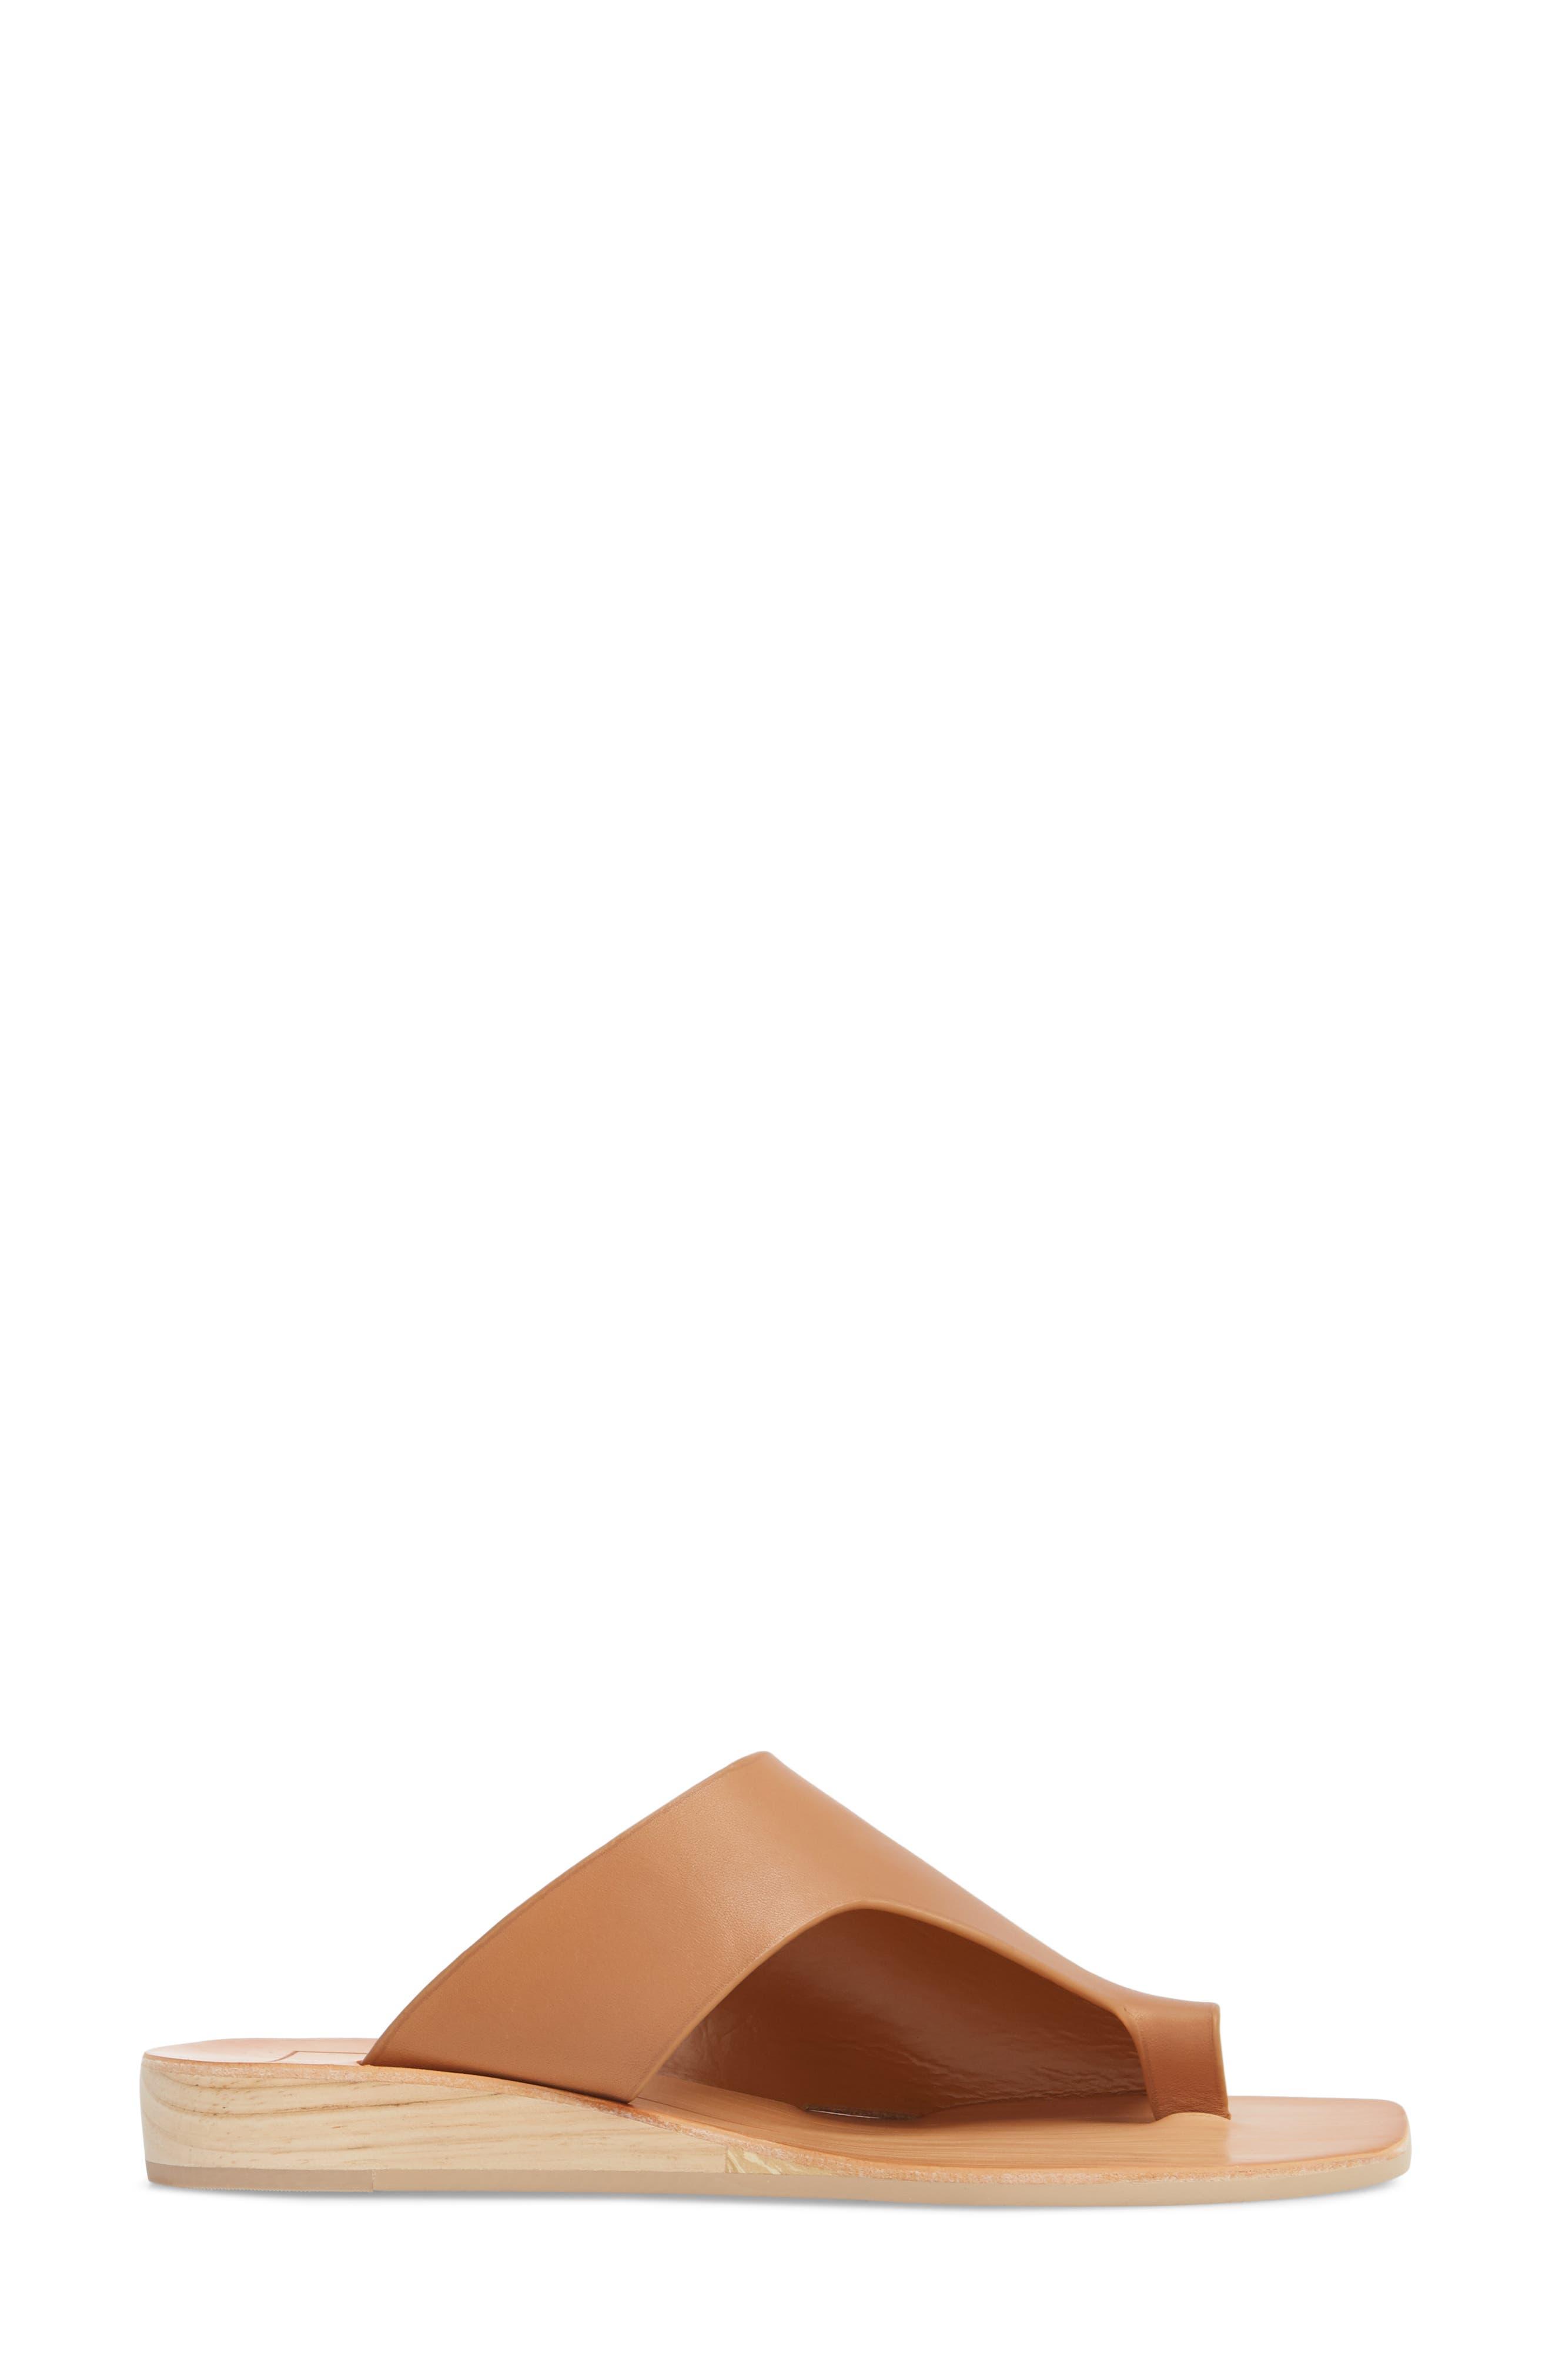 Hazle Asymmetrical Toe Loop Sandal,                             Alternate thumbnail 3, color,                             Caramel